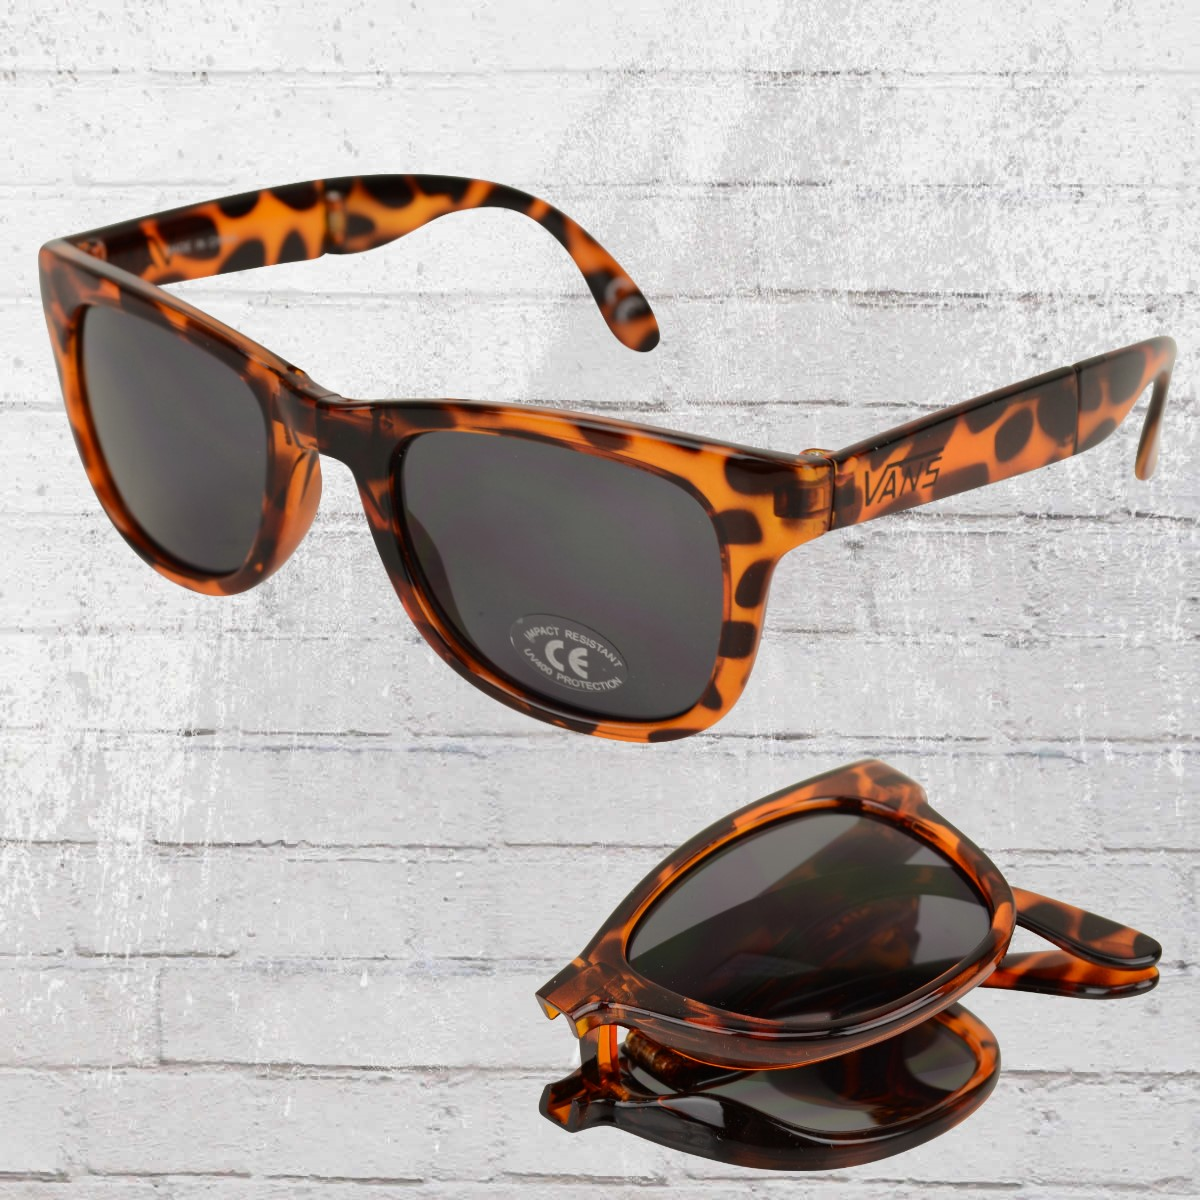 bf2333d470 VANS Sunglasses Foldable Spicoli translucent honey tortoise. ›‹ «